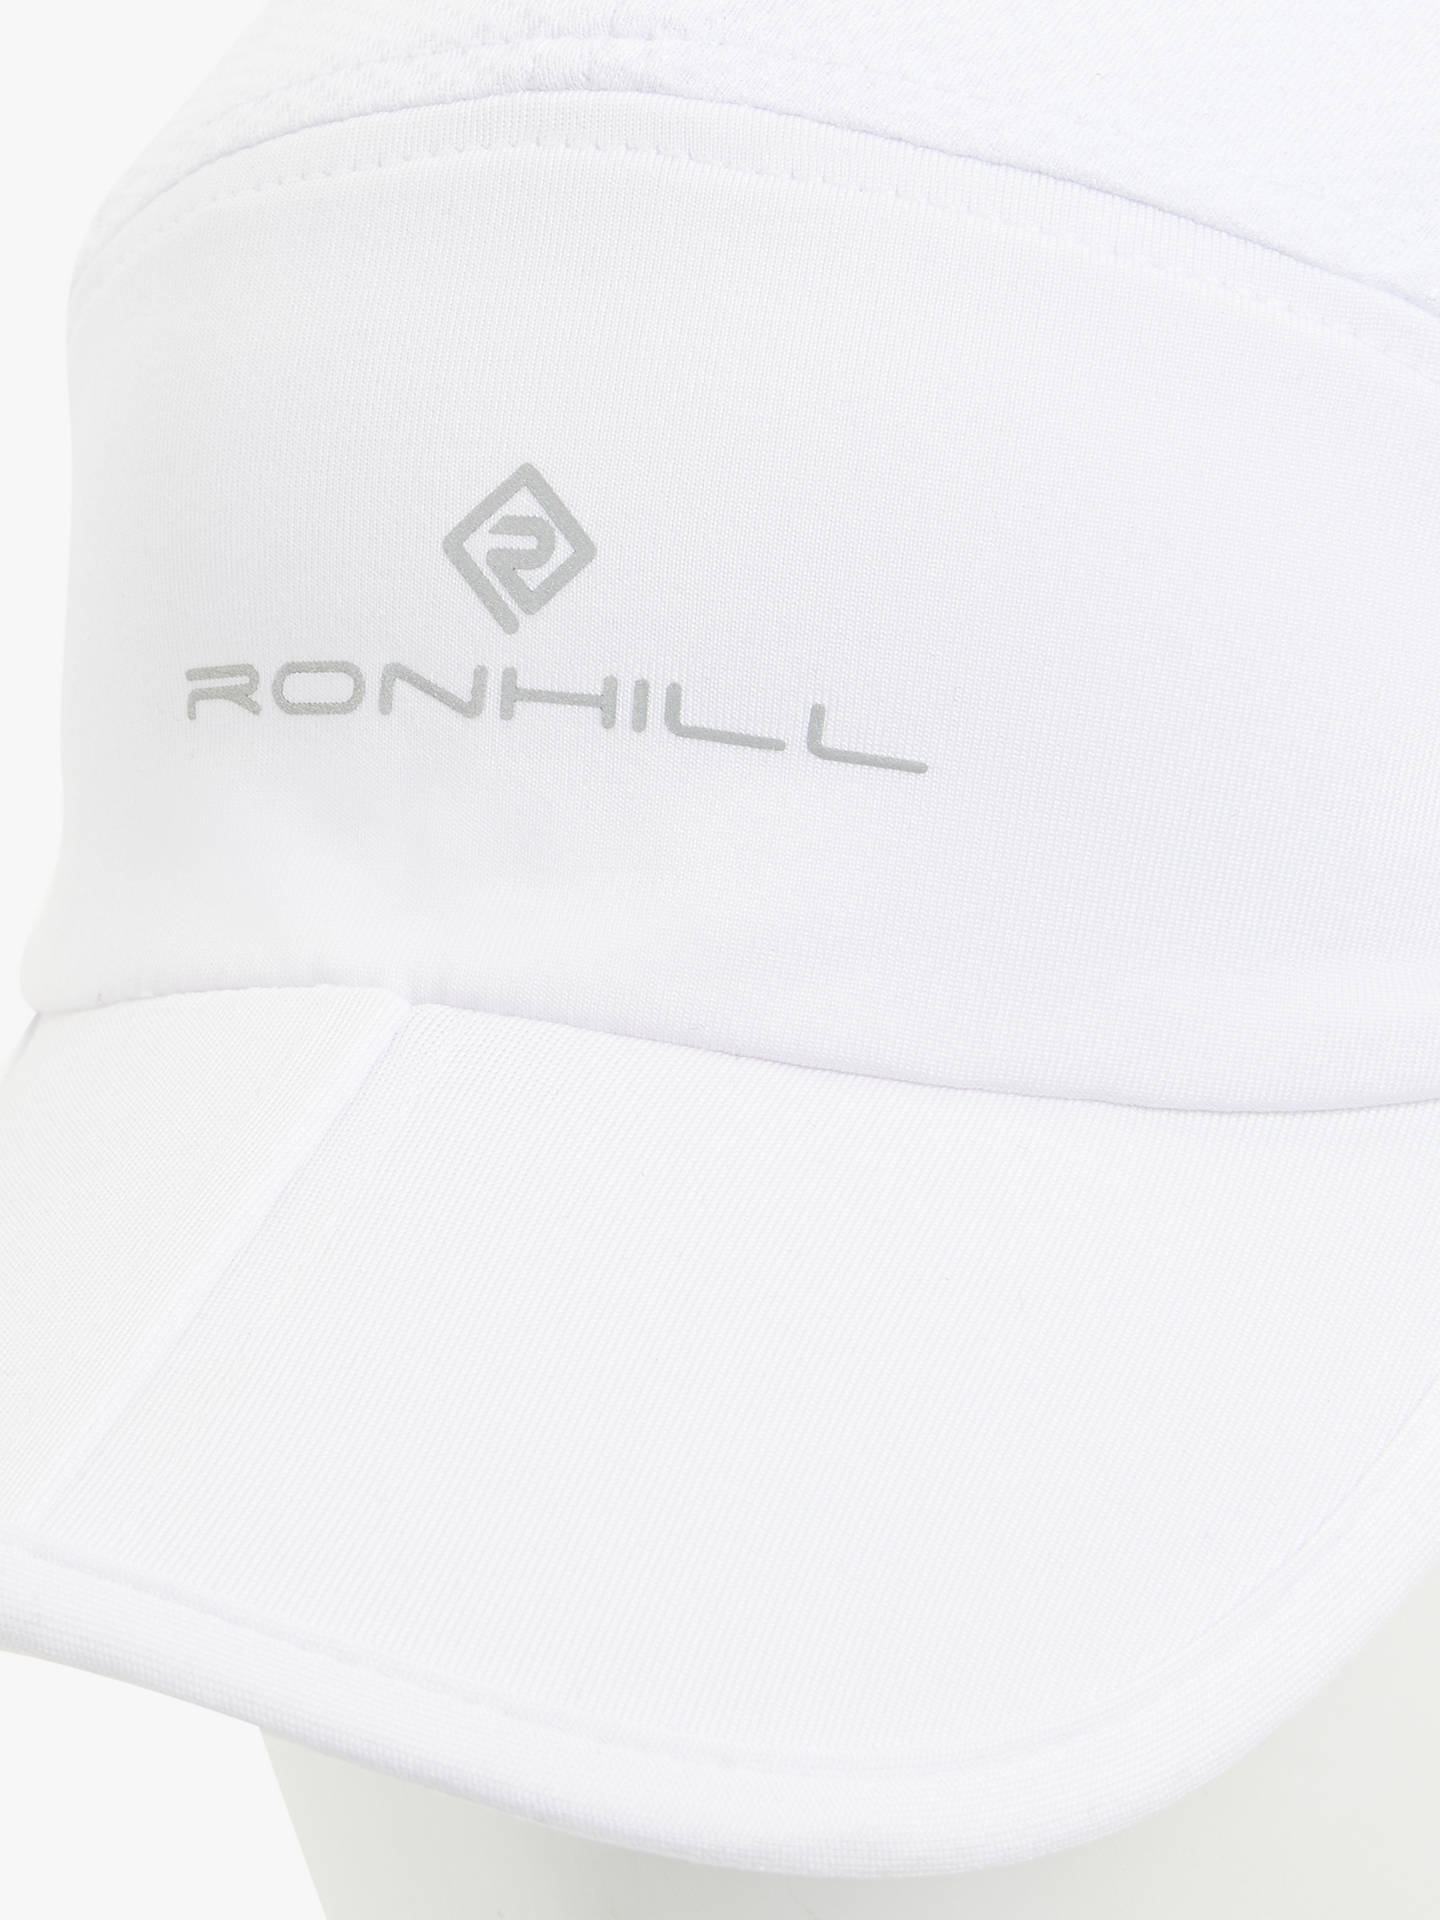 Ronhill Split Air-lite Cap